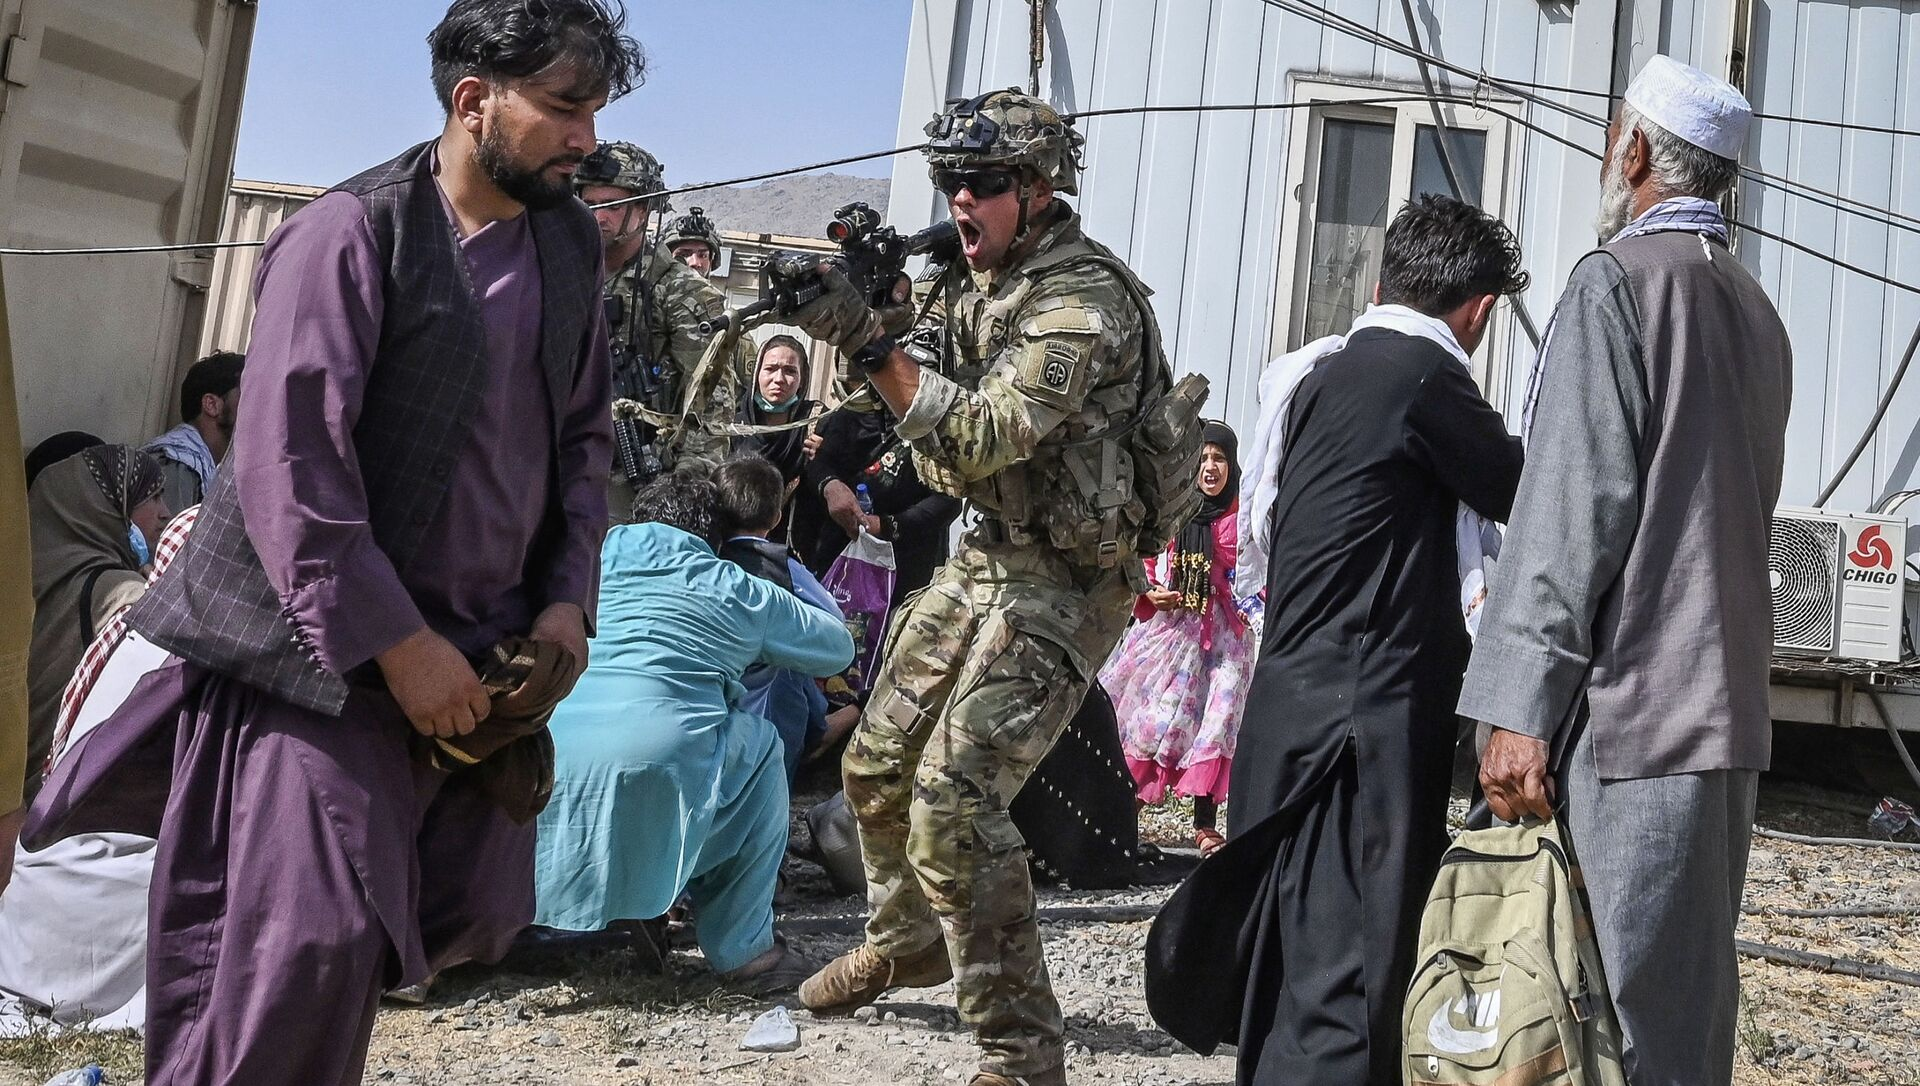 Американский солдат целится на афганцев в аэропорту Кабула  - Sputnik Азербайджан, 1920, 18.08.2021